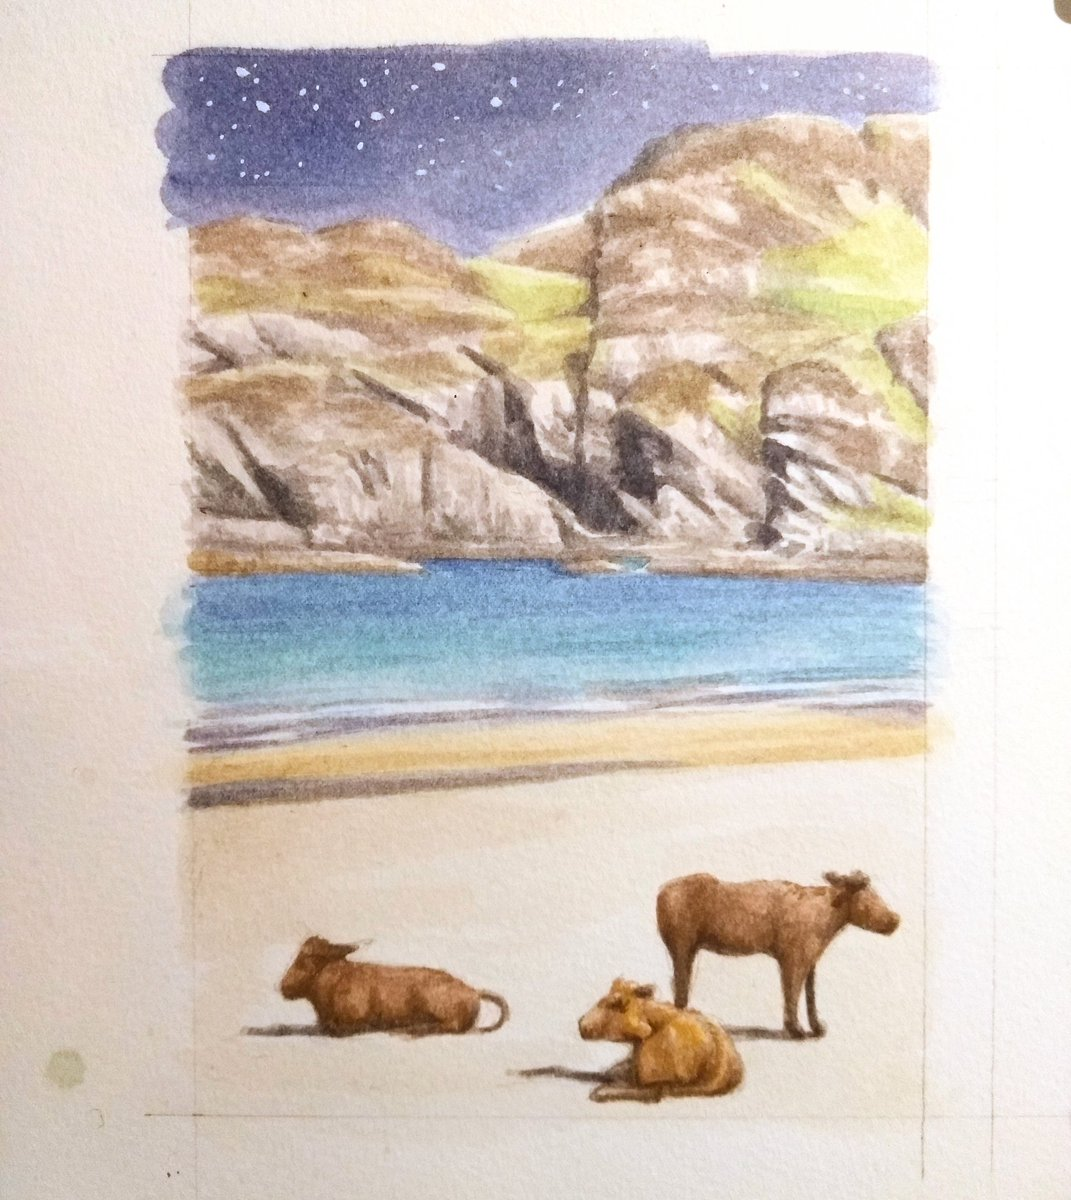 test Twitter Media - Cows on a beach. Kiloran Bay, Colonsay. Scotland. #watercolour https://t.co/DCfGkQ7aVL